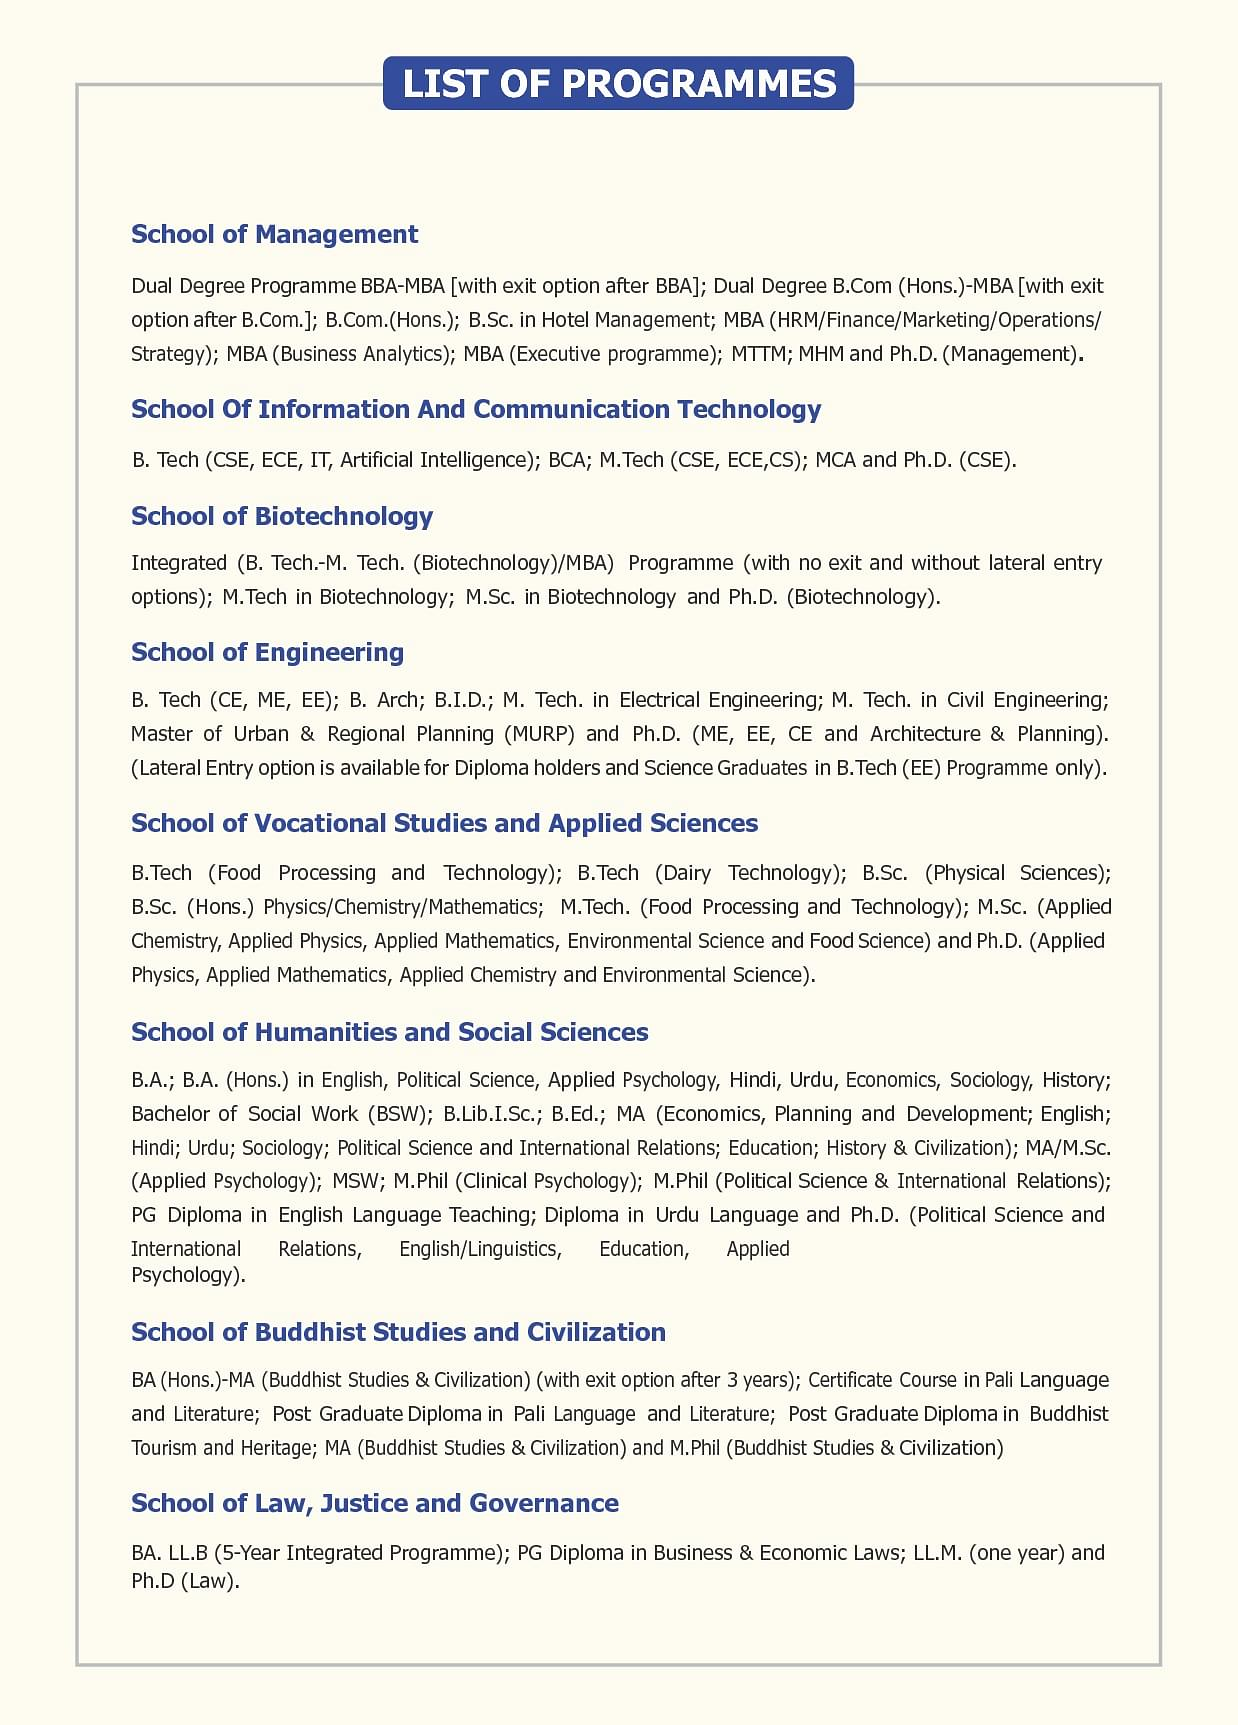 Gautam Buddha University, School of Information and